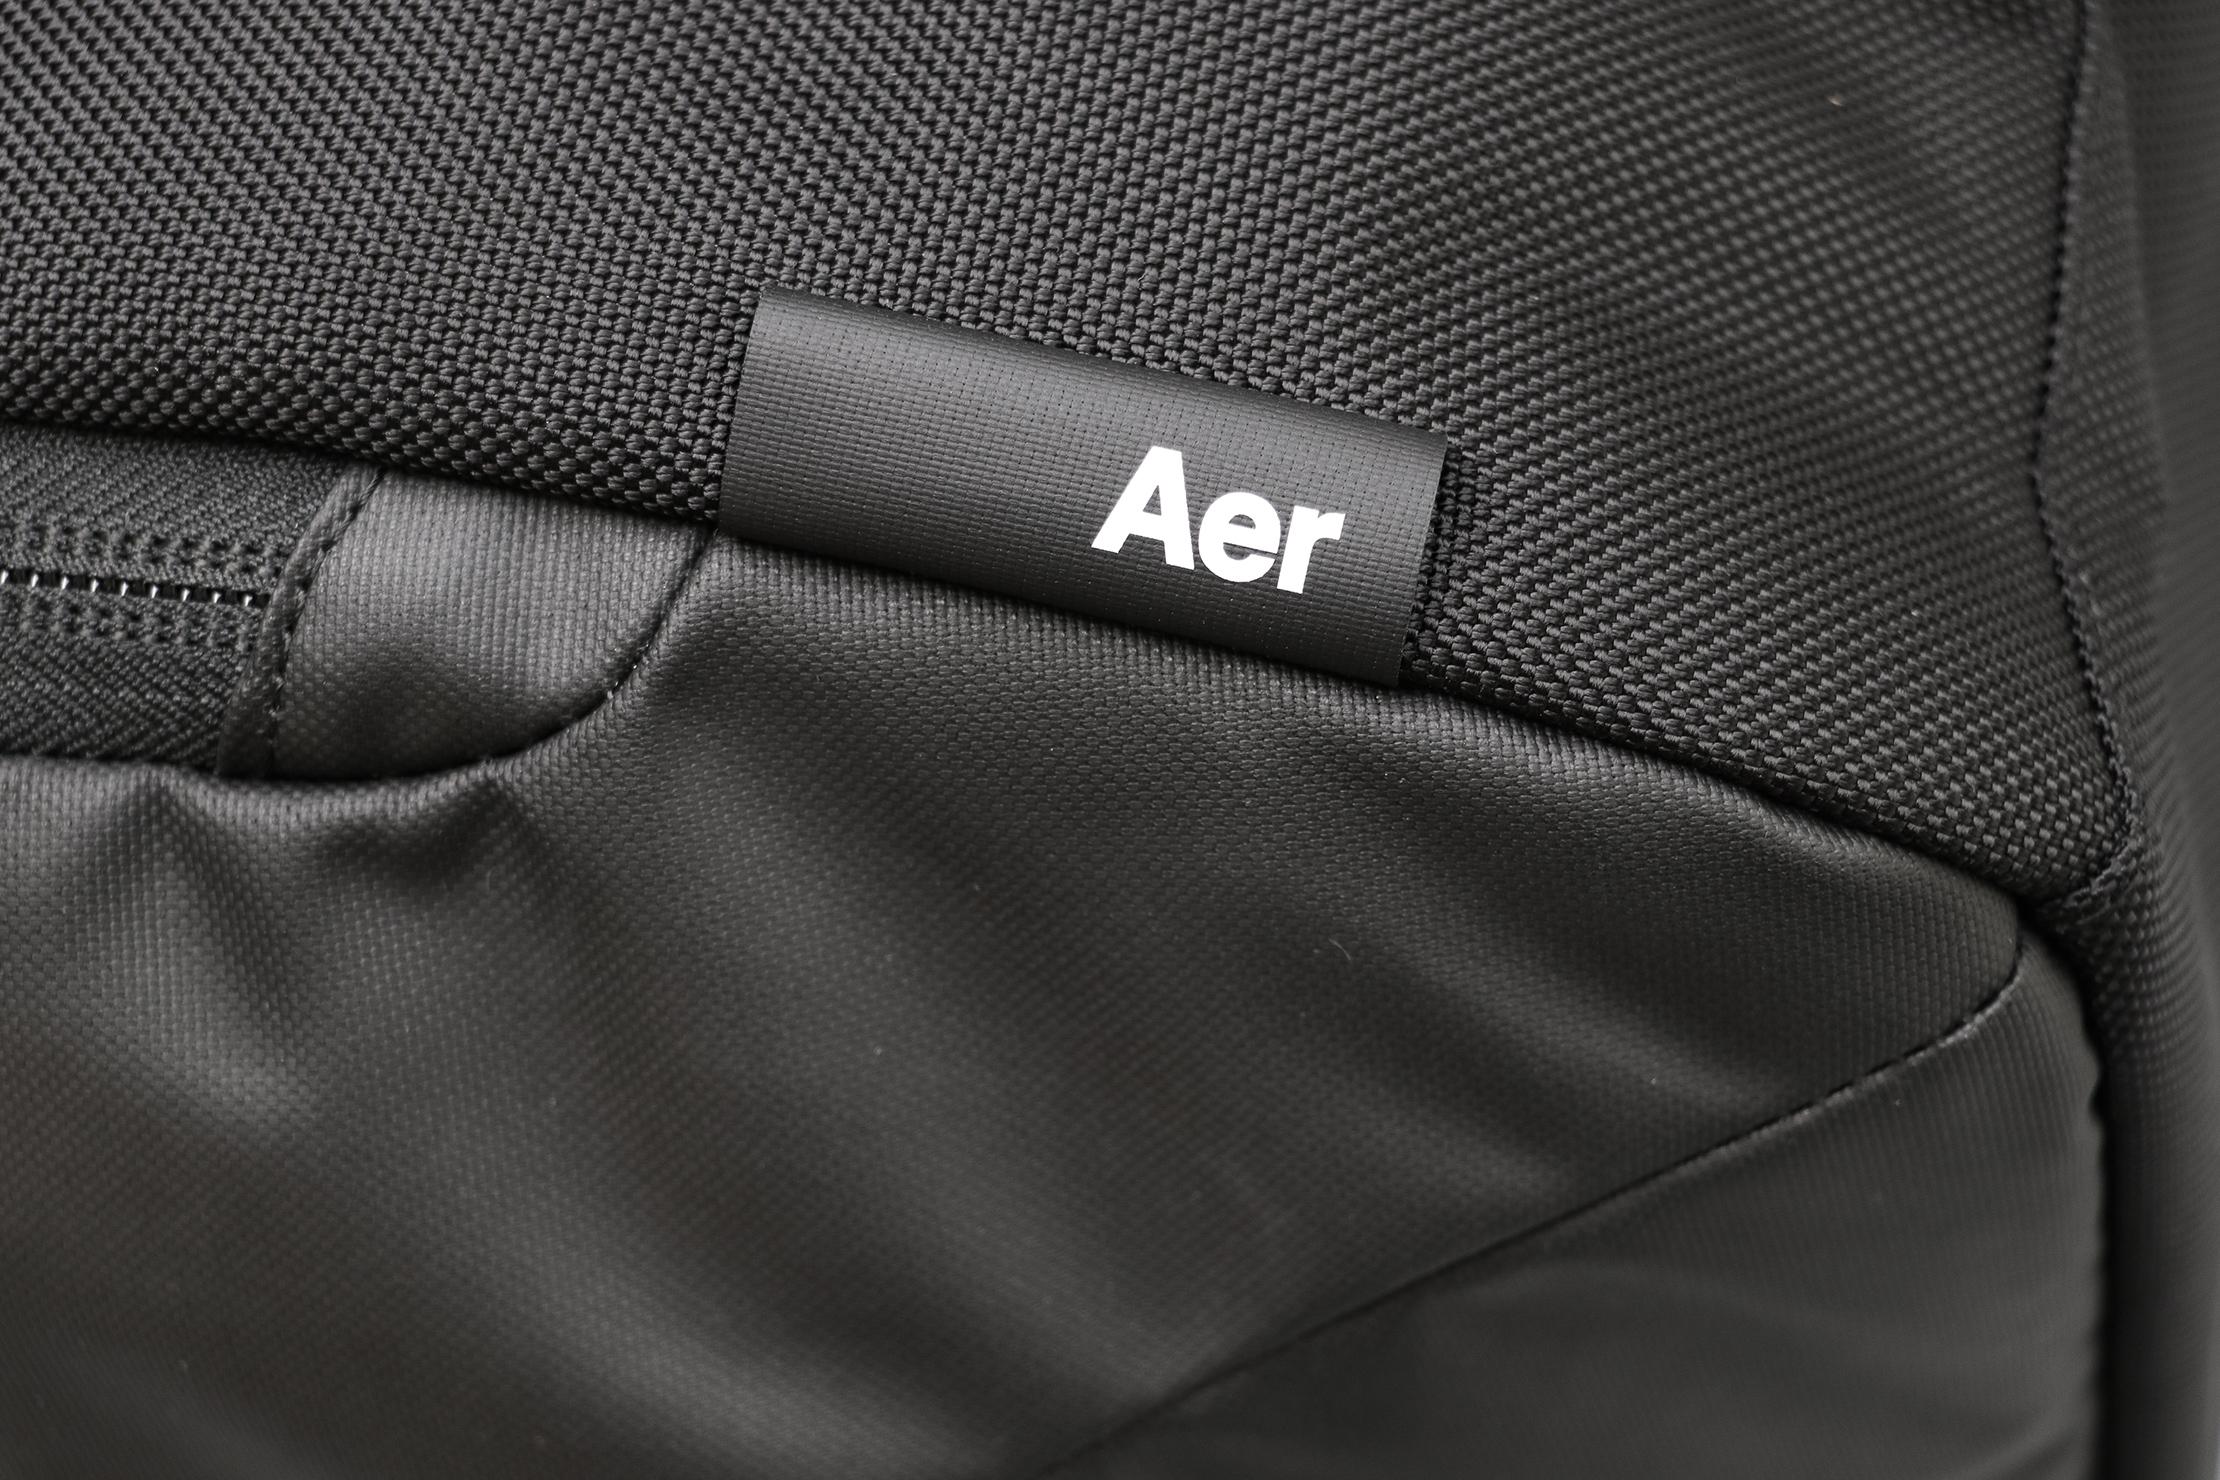 Aer Commuter Brief 2 Materials & Logo